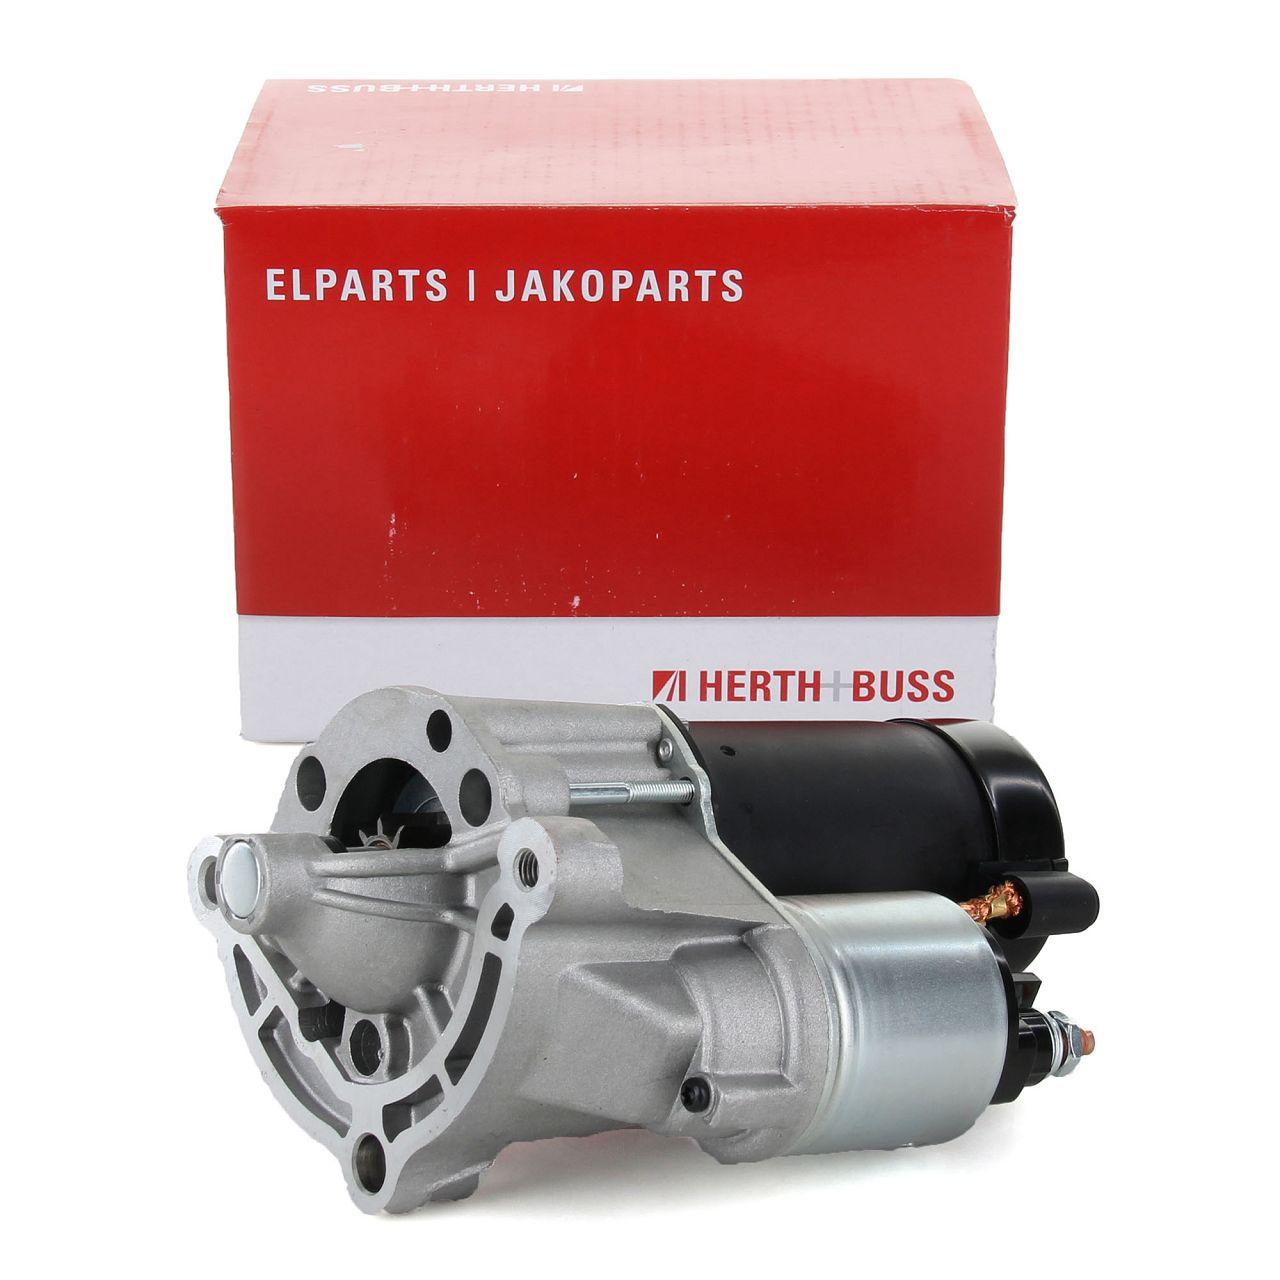 HERTH+BUSS ELPARTS Starter Anlasser 12V 1 kW CITROEN Ax Berlingo FIAT Fiorino PEUGEOT 307